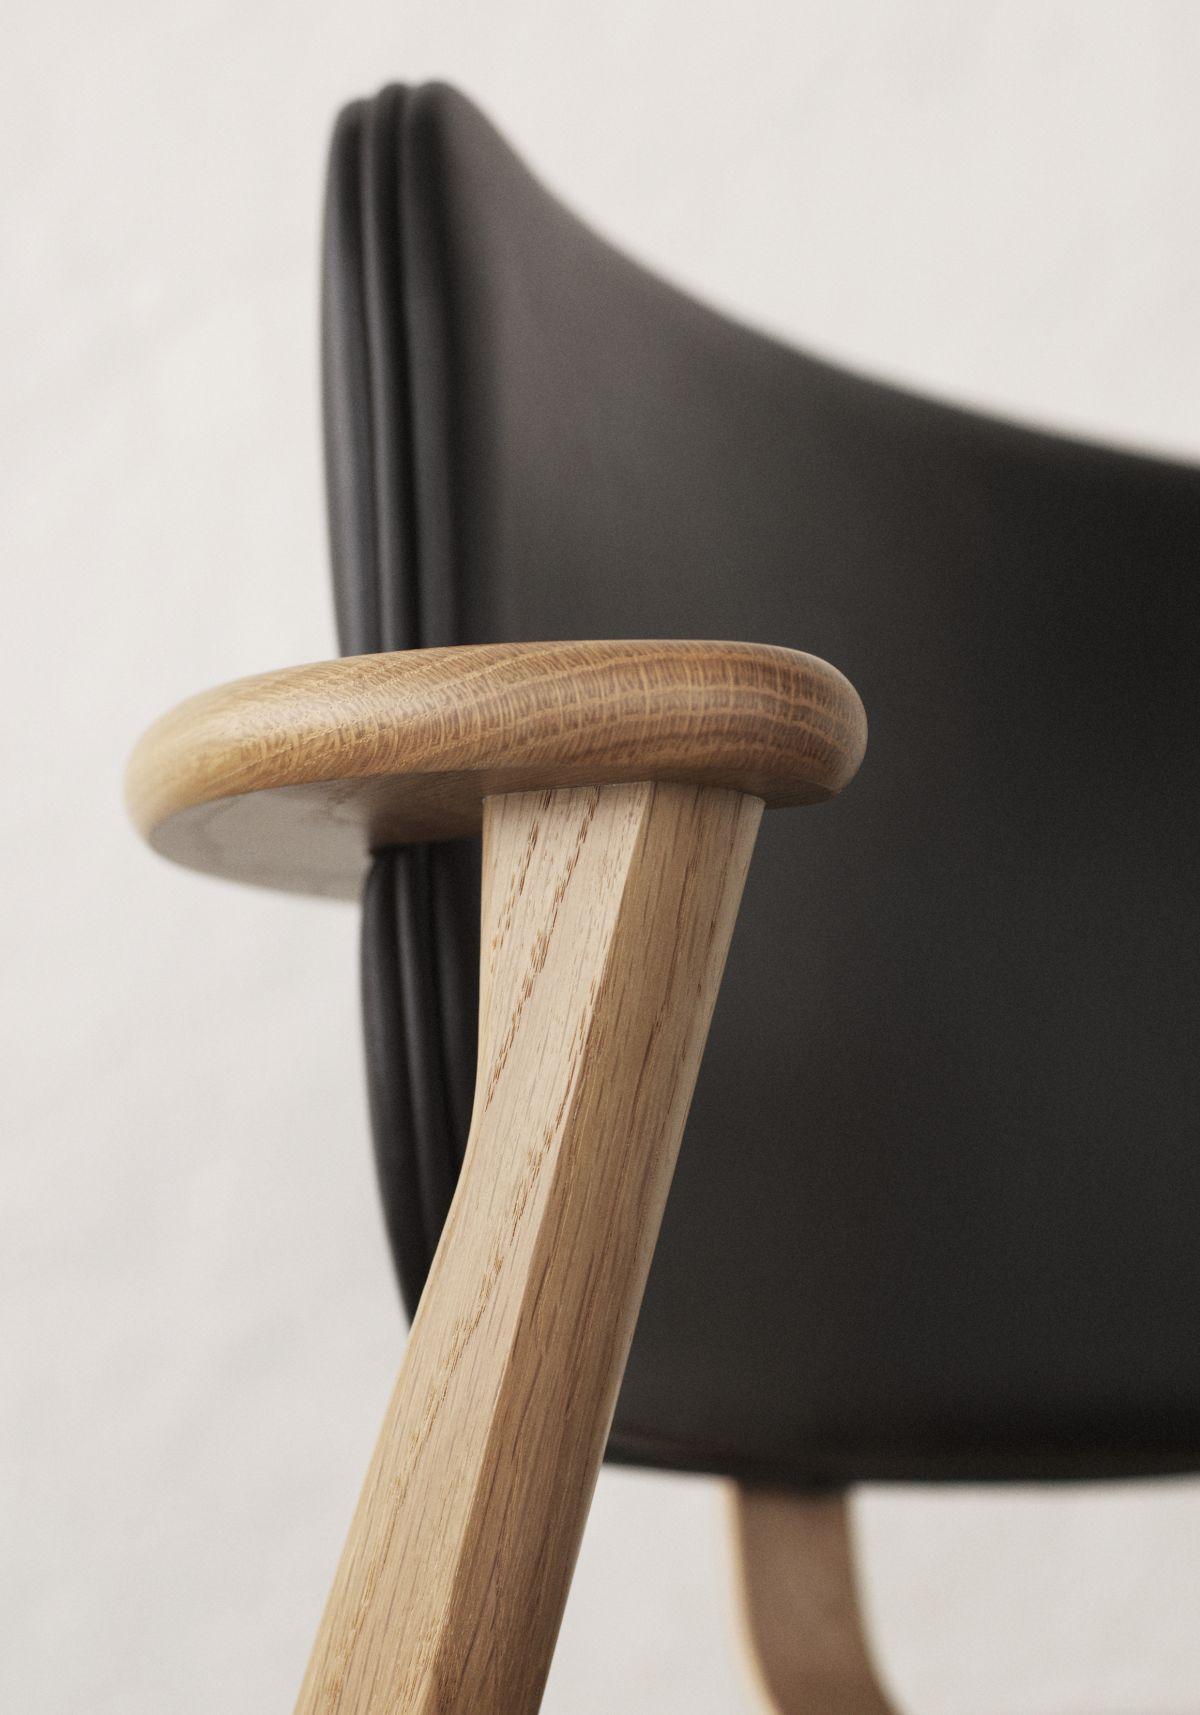 Domus Chair birch black leather upholstery - armrest detail